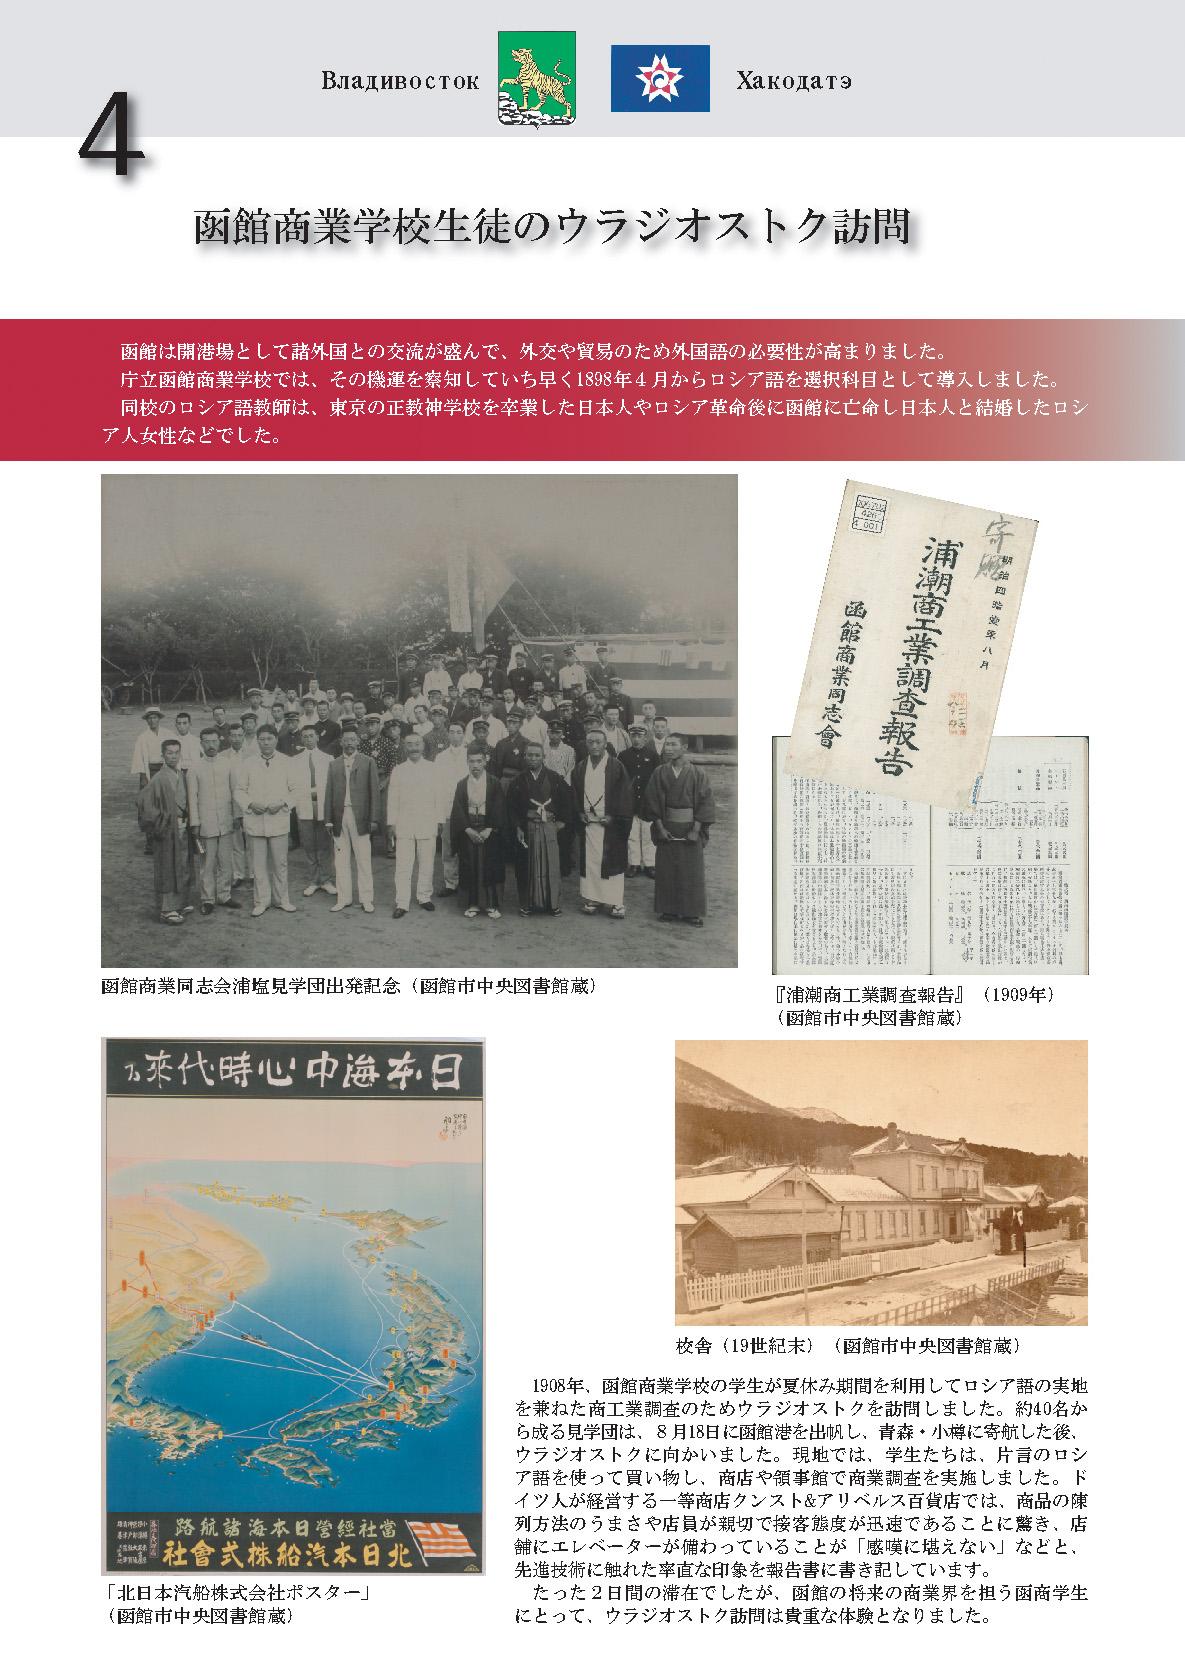 http://hakodate-russia.com/main/image/2011-07.jpg